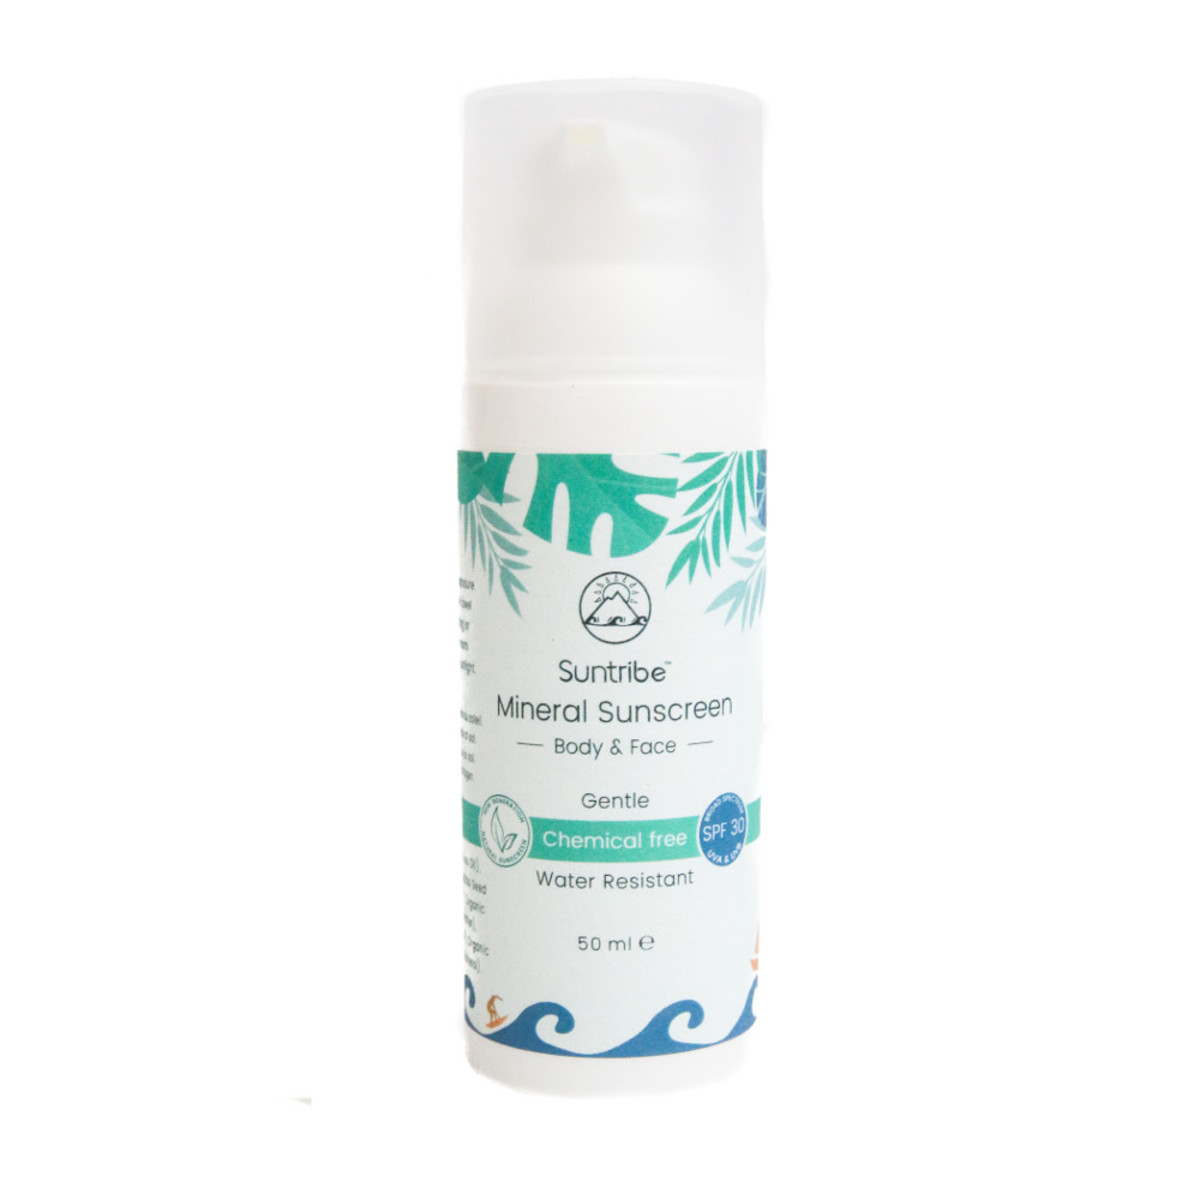 Suntribe Eco Body & Face Mineral Sunscreen